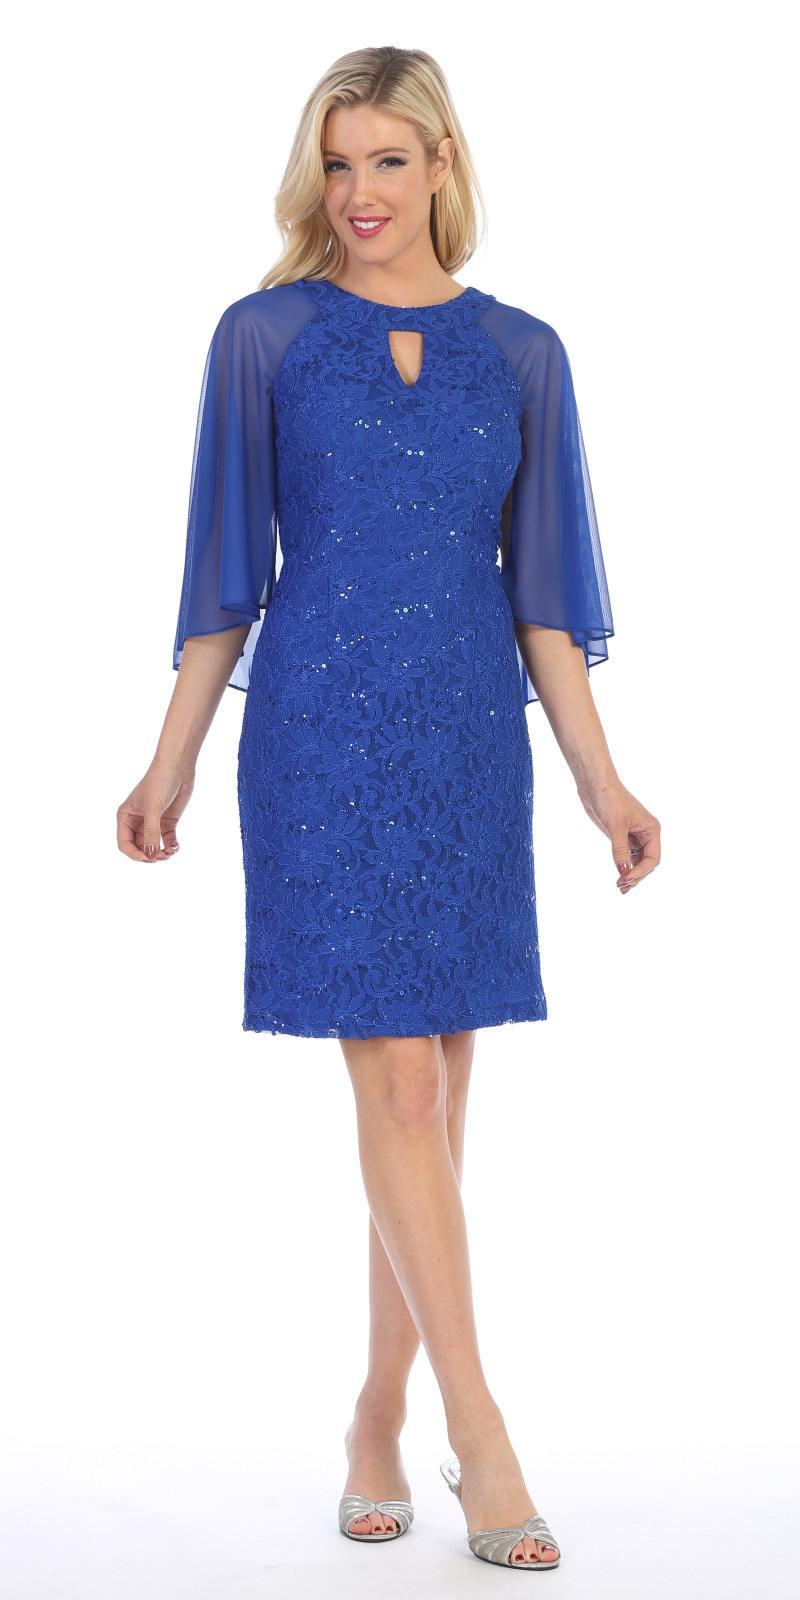 Celavie 6352S Royal Blue Wedding Guest Dress with Flutter Sleeves  DiscountDressShop